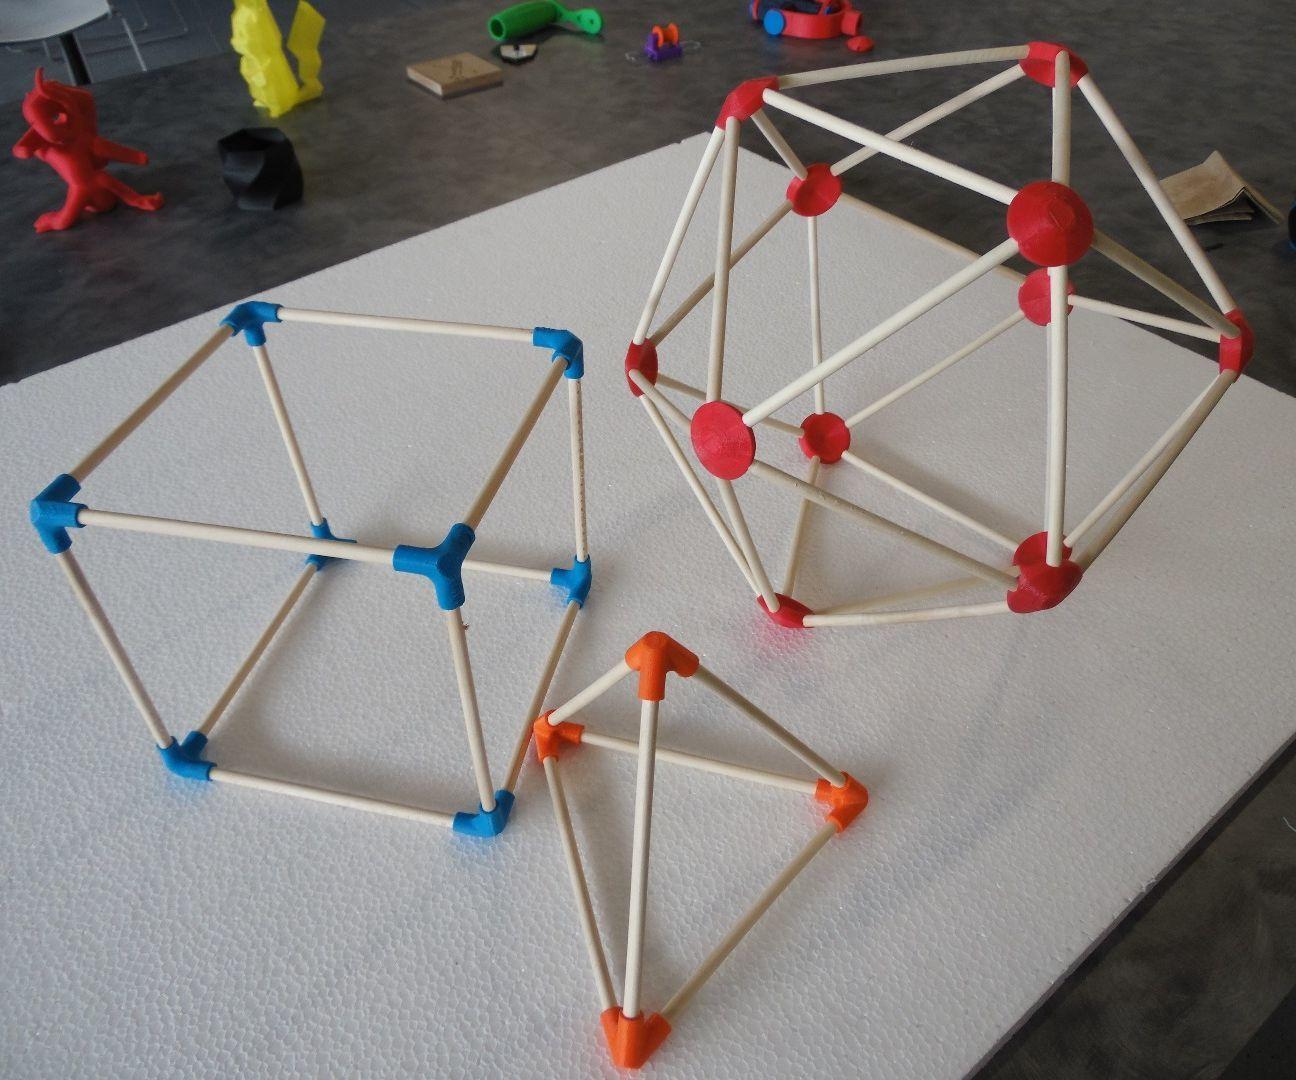 3D Printed Geometry Connectors 3d printing, 3d printing